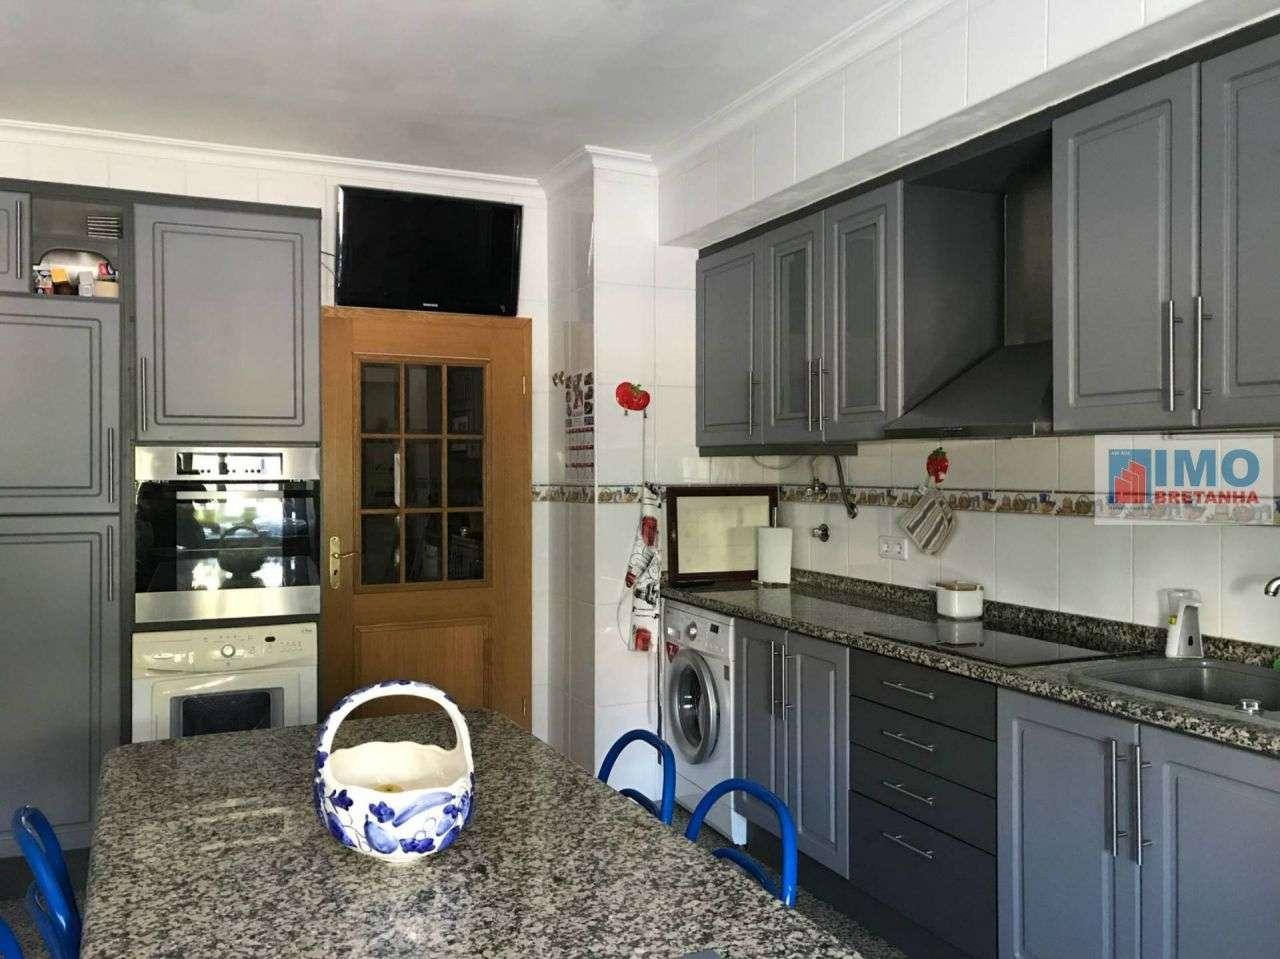 Apartamento para comprar, Boidobra, Castelo Branco - Foto 2